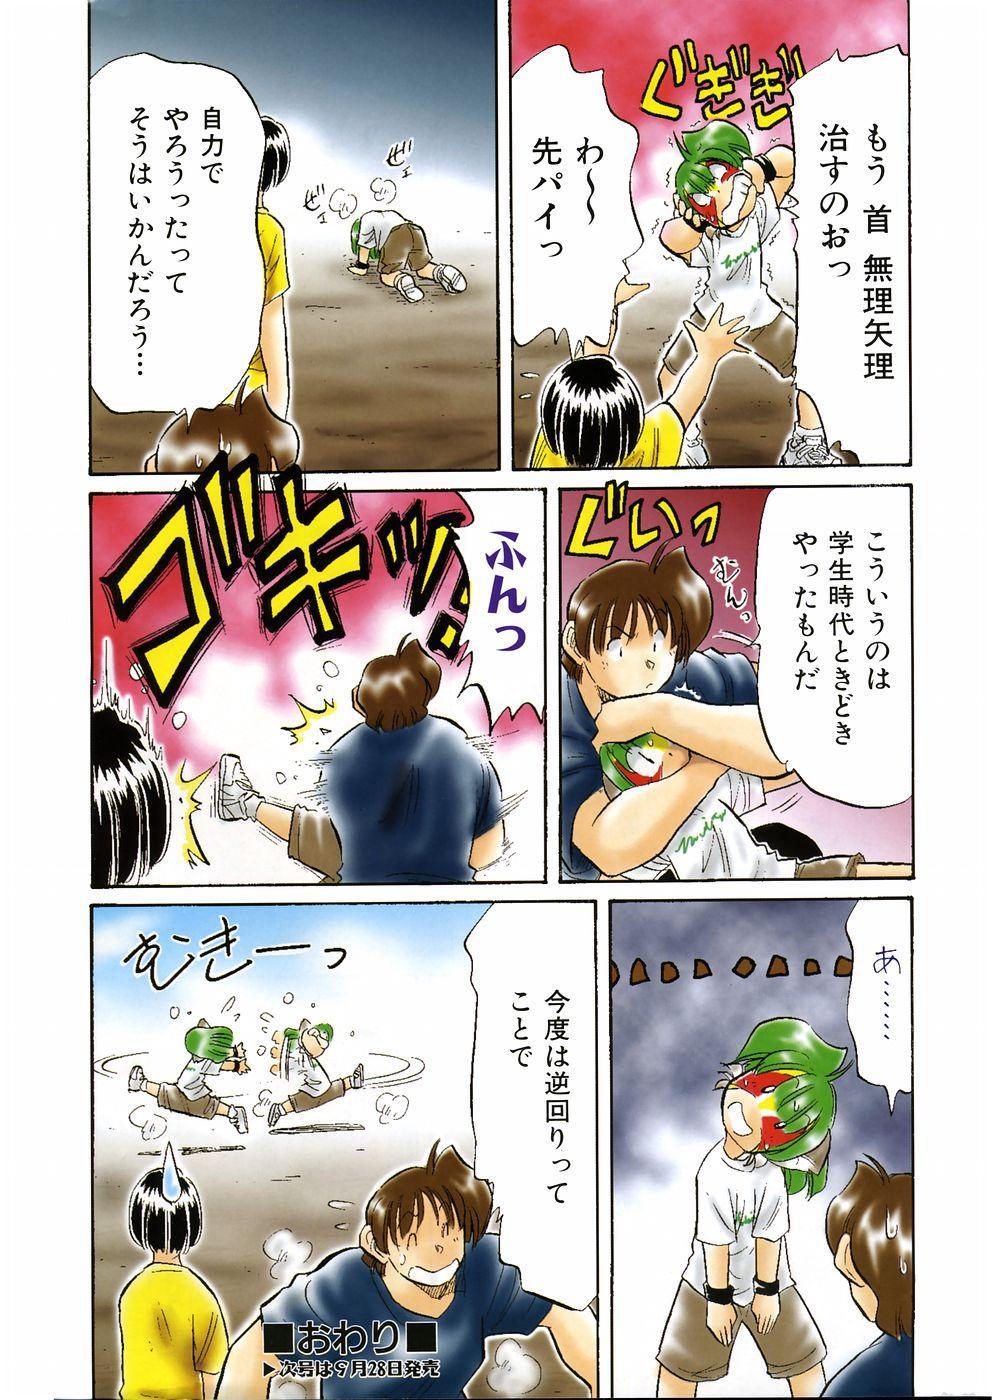 COMIC AUN 2005-10 Vol. 113 378